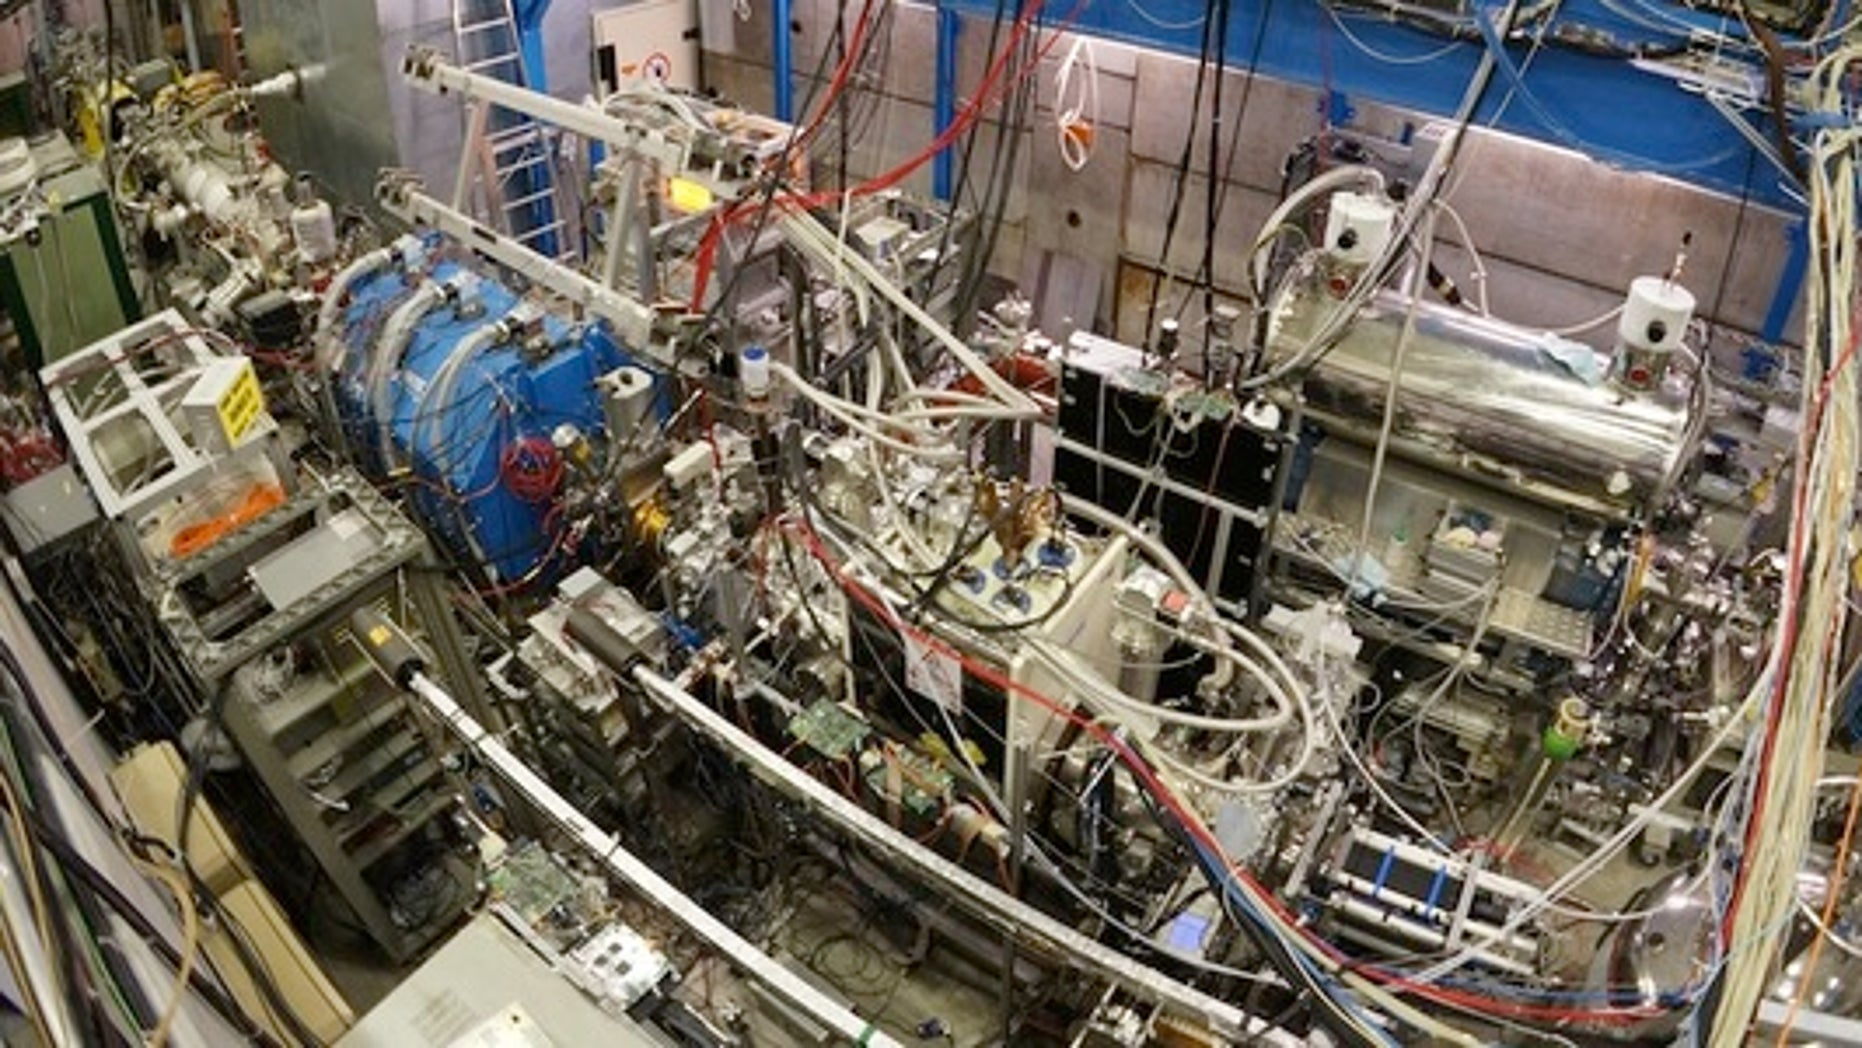 Equipment in the Antiproton Decelerator at CERN.